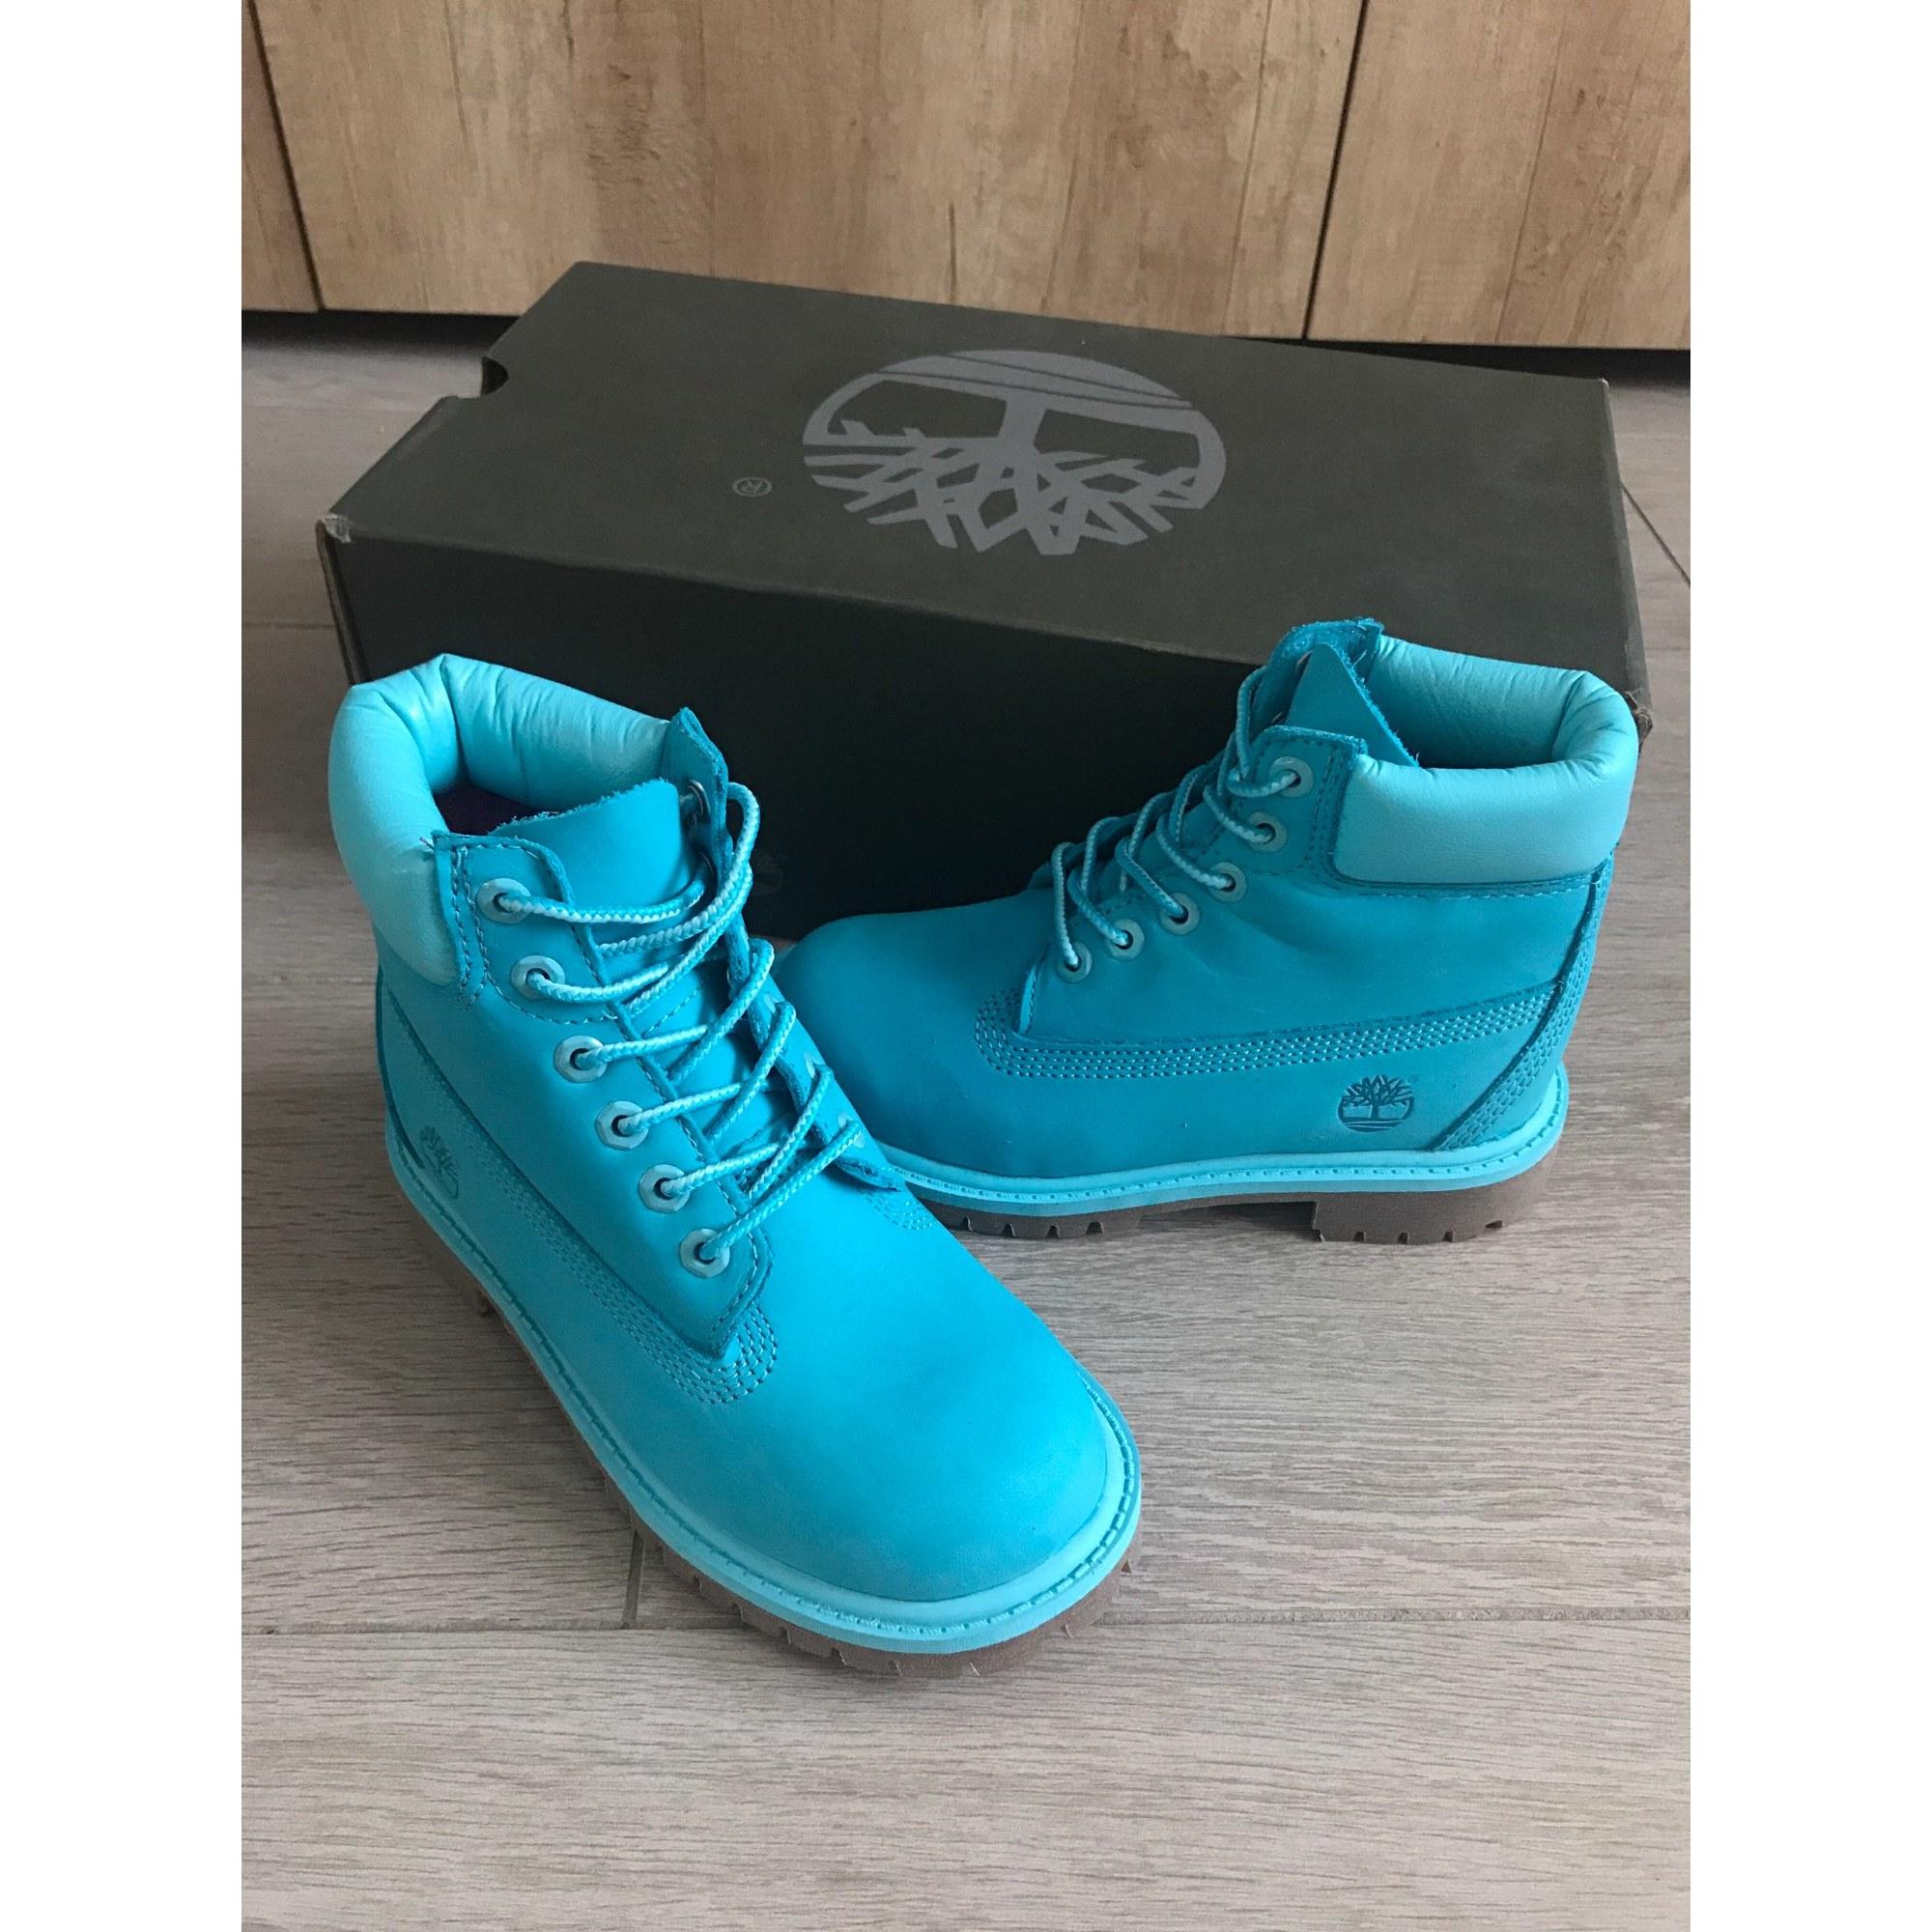 Chaussures à boucle TIMBERLAND Bleu, bleu marine, bleu turquoise